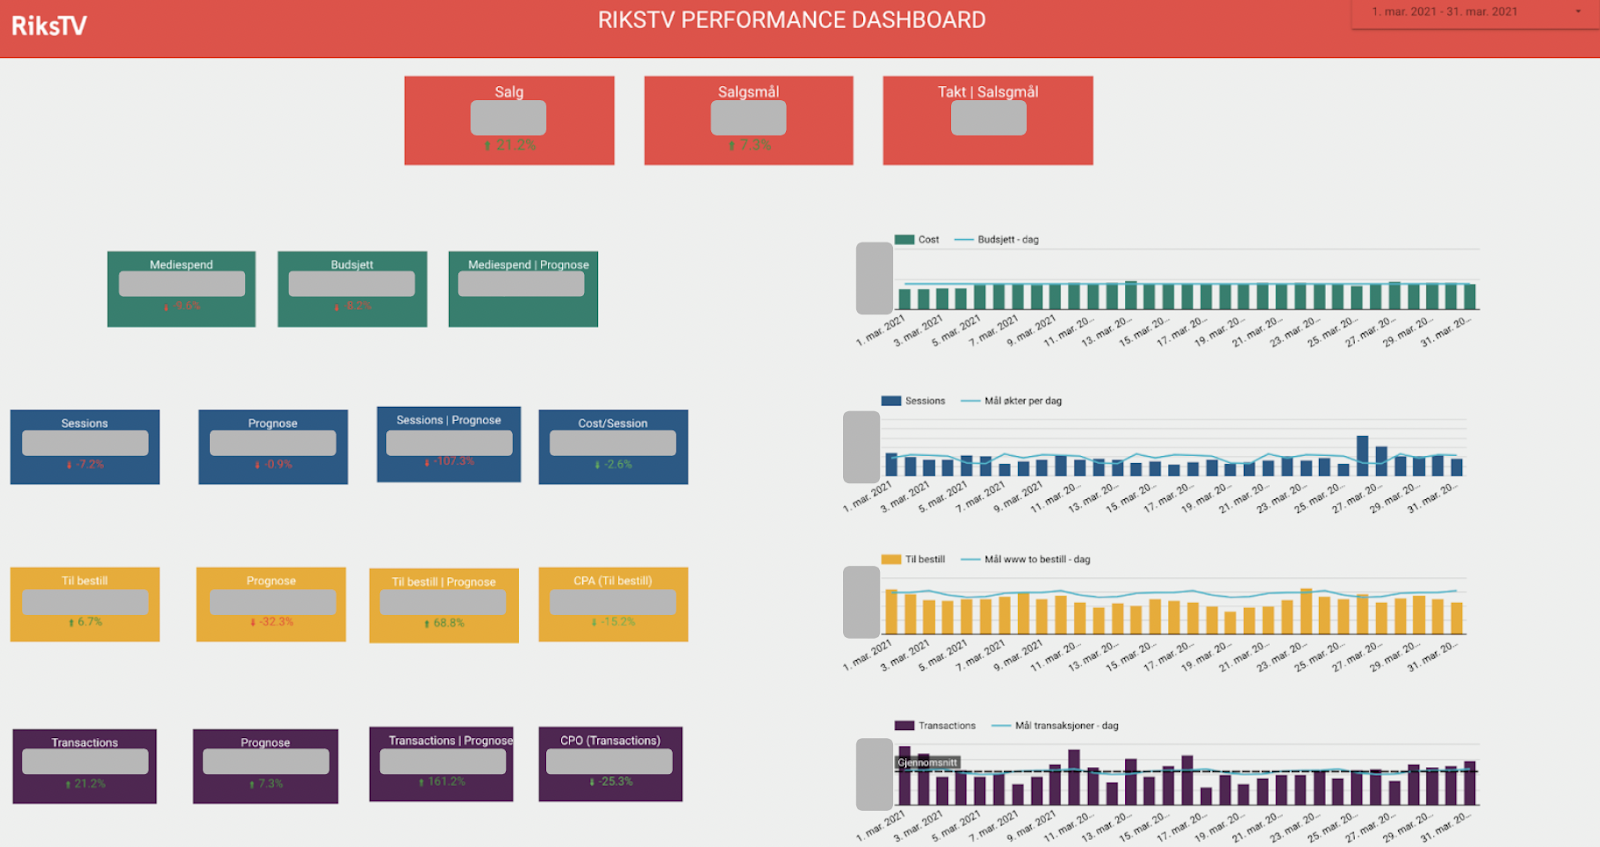 An snapshot of Riks TV performance dashboard